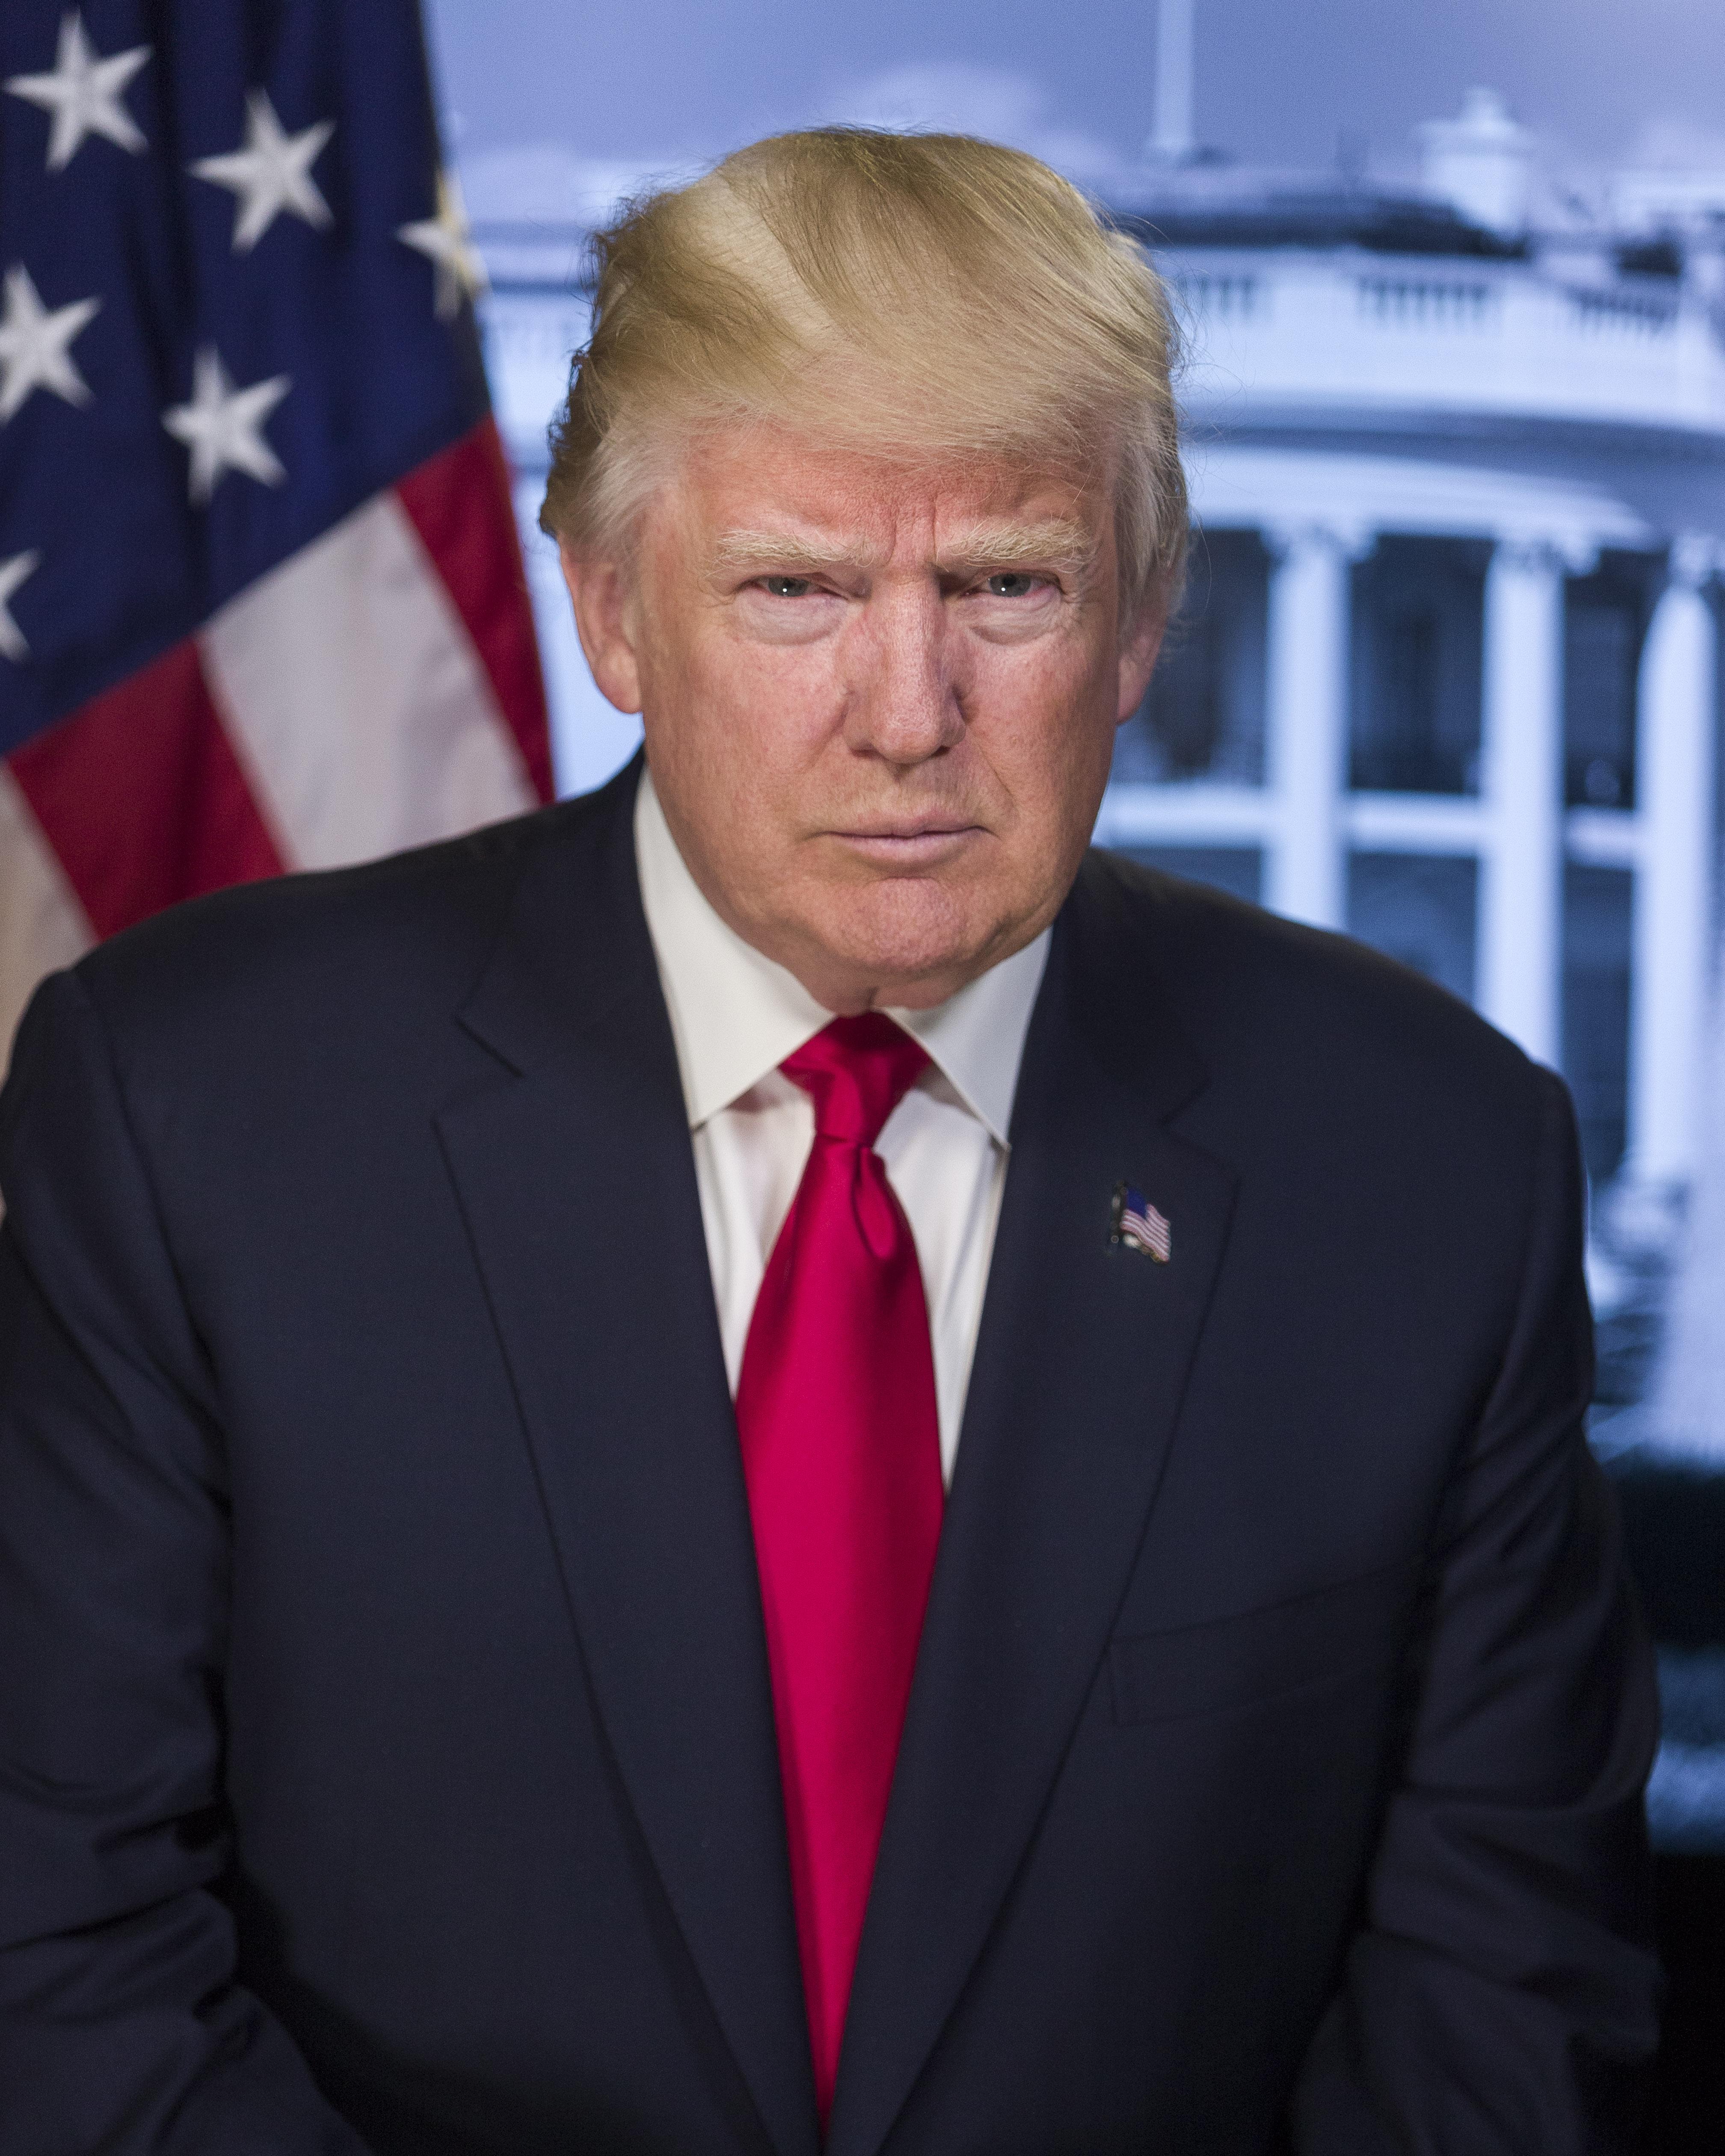 image of Donald J. Trump